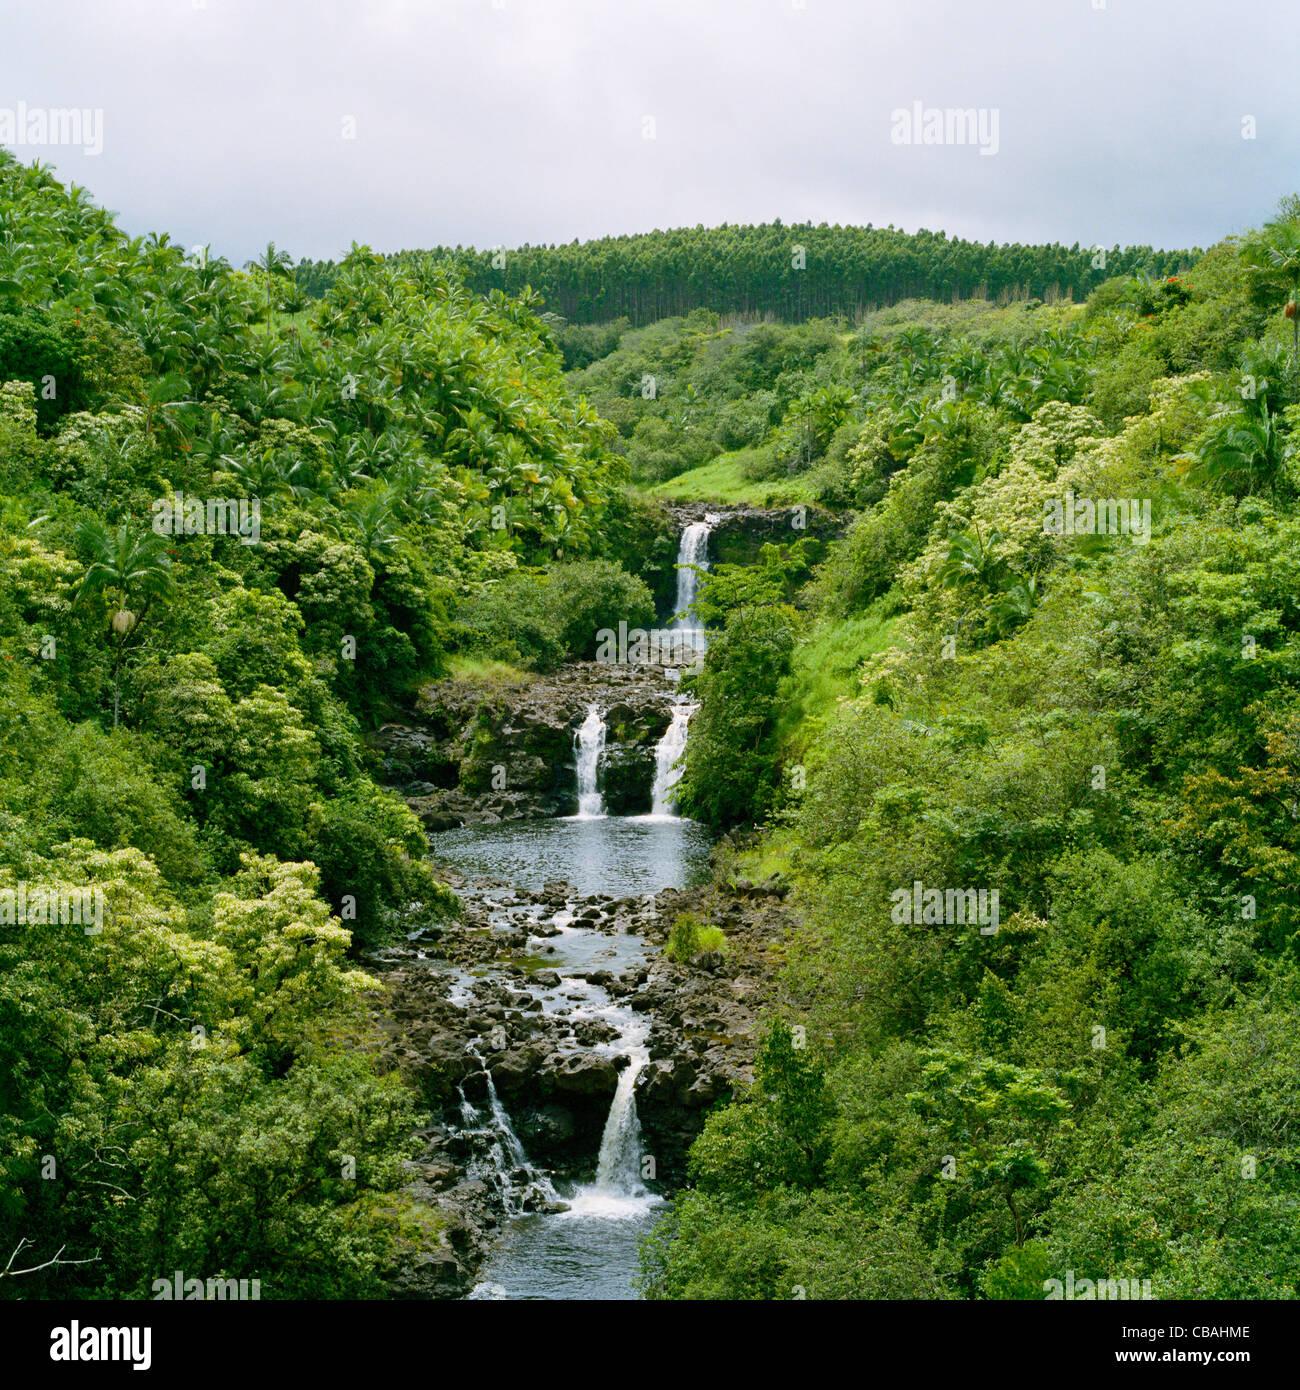 Umauma Falls World Tropical Botanical Gardens Big Island Hawaii Stock Photo Royalty Free Image